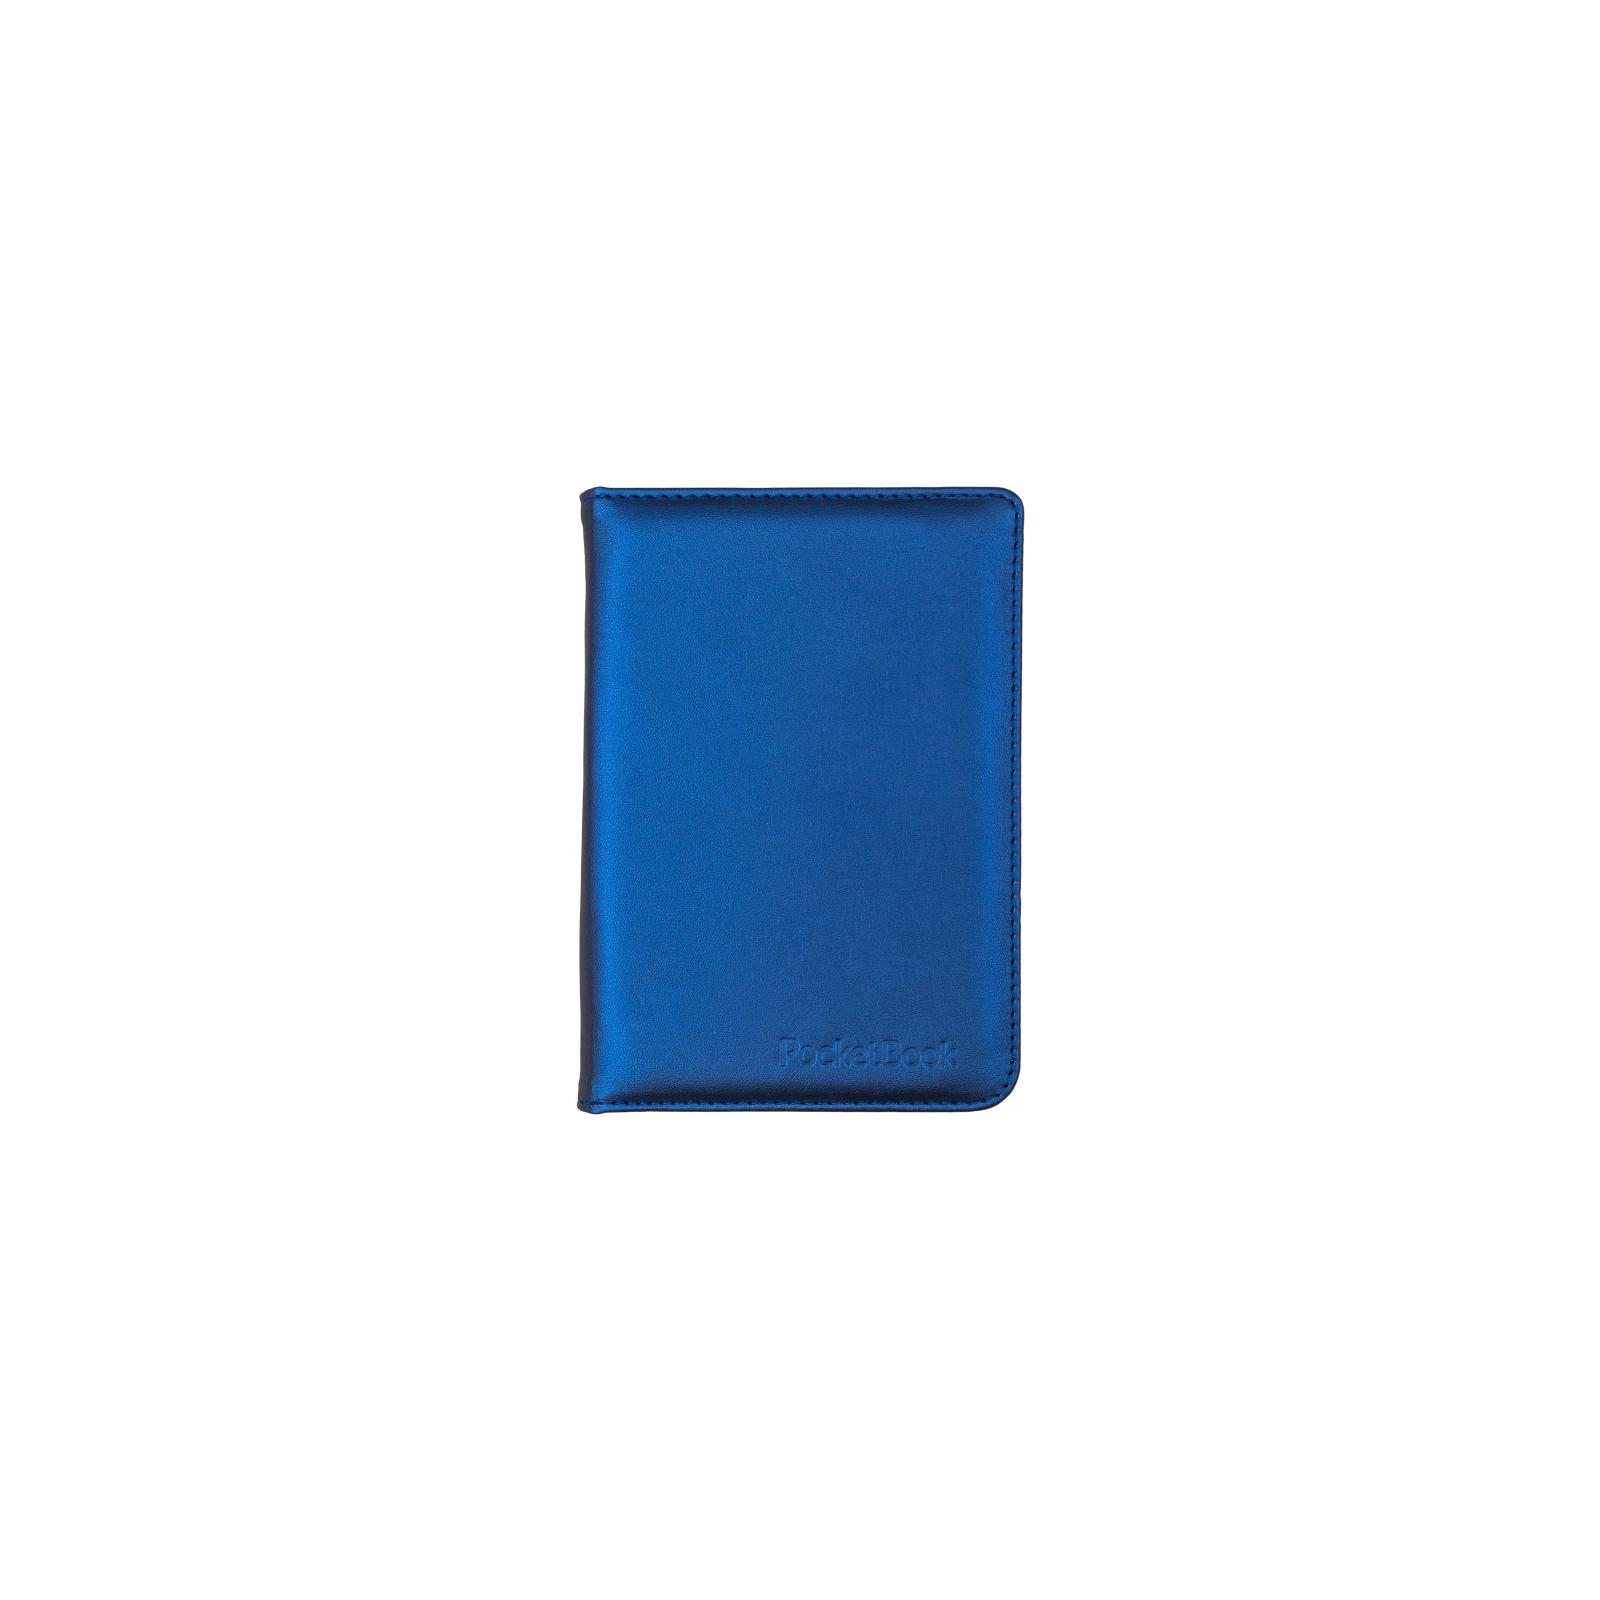 "Чехол для электронной книги Pocketbook 7.8"" для PB740 blue (VLPB-TB740MBLU1)"